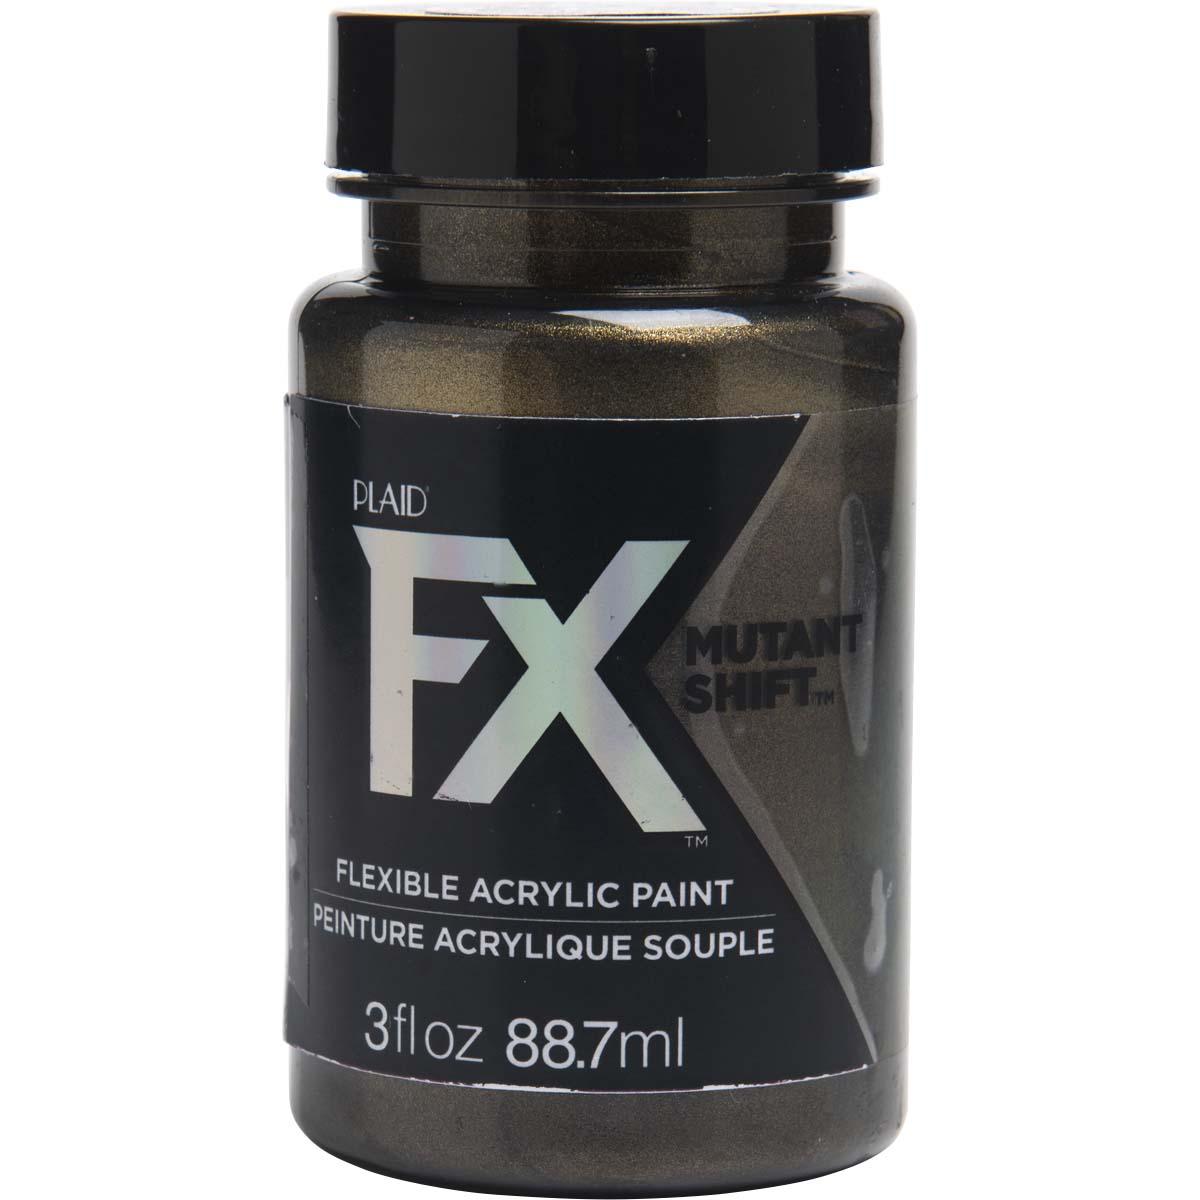 PlaidFX Mutant Shift Flexible Acrylic Paint - Gamma Ray, 3 oz. - 36914